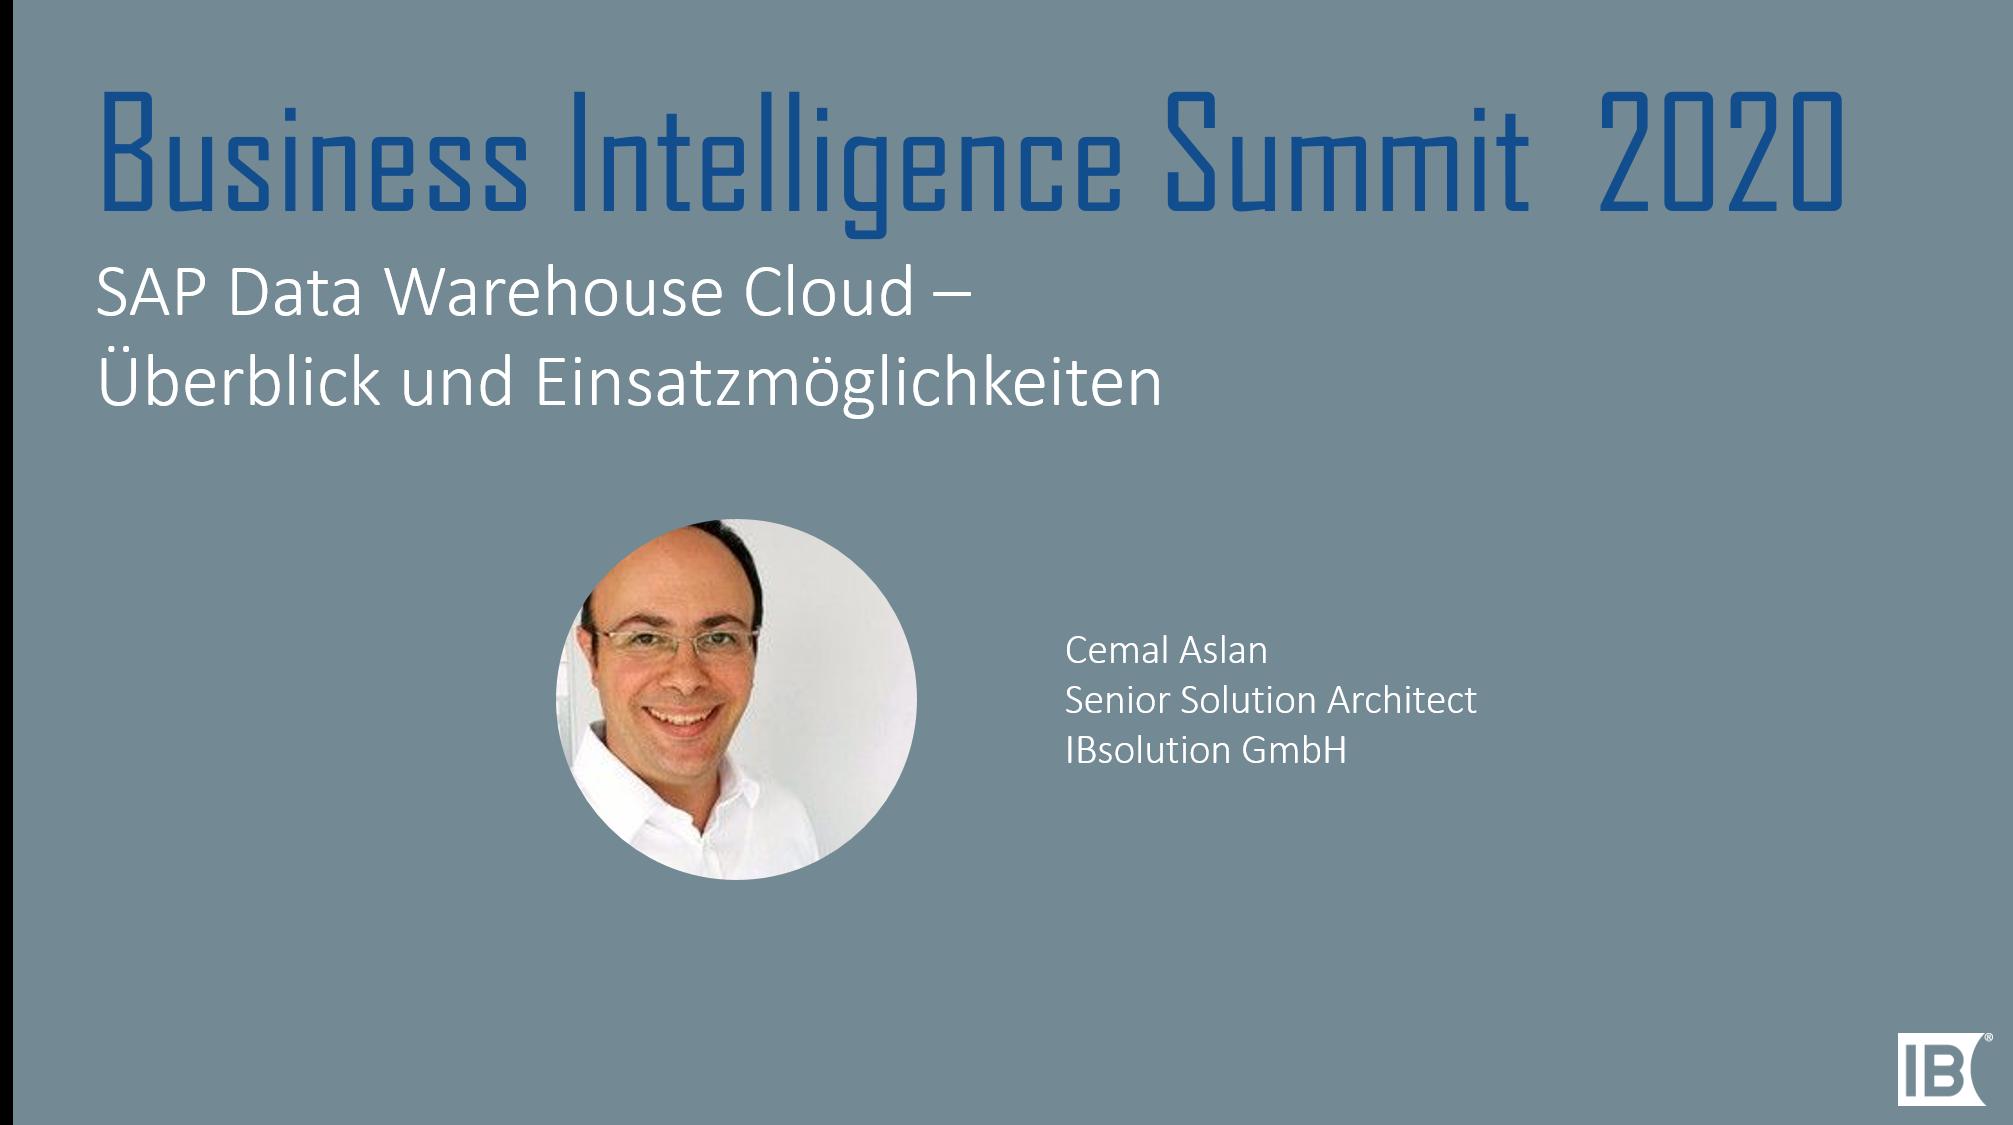 SAP Data Warehouse Cloud Vortrag